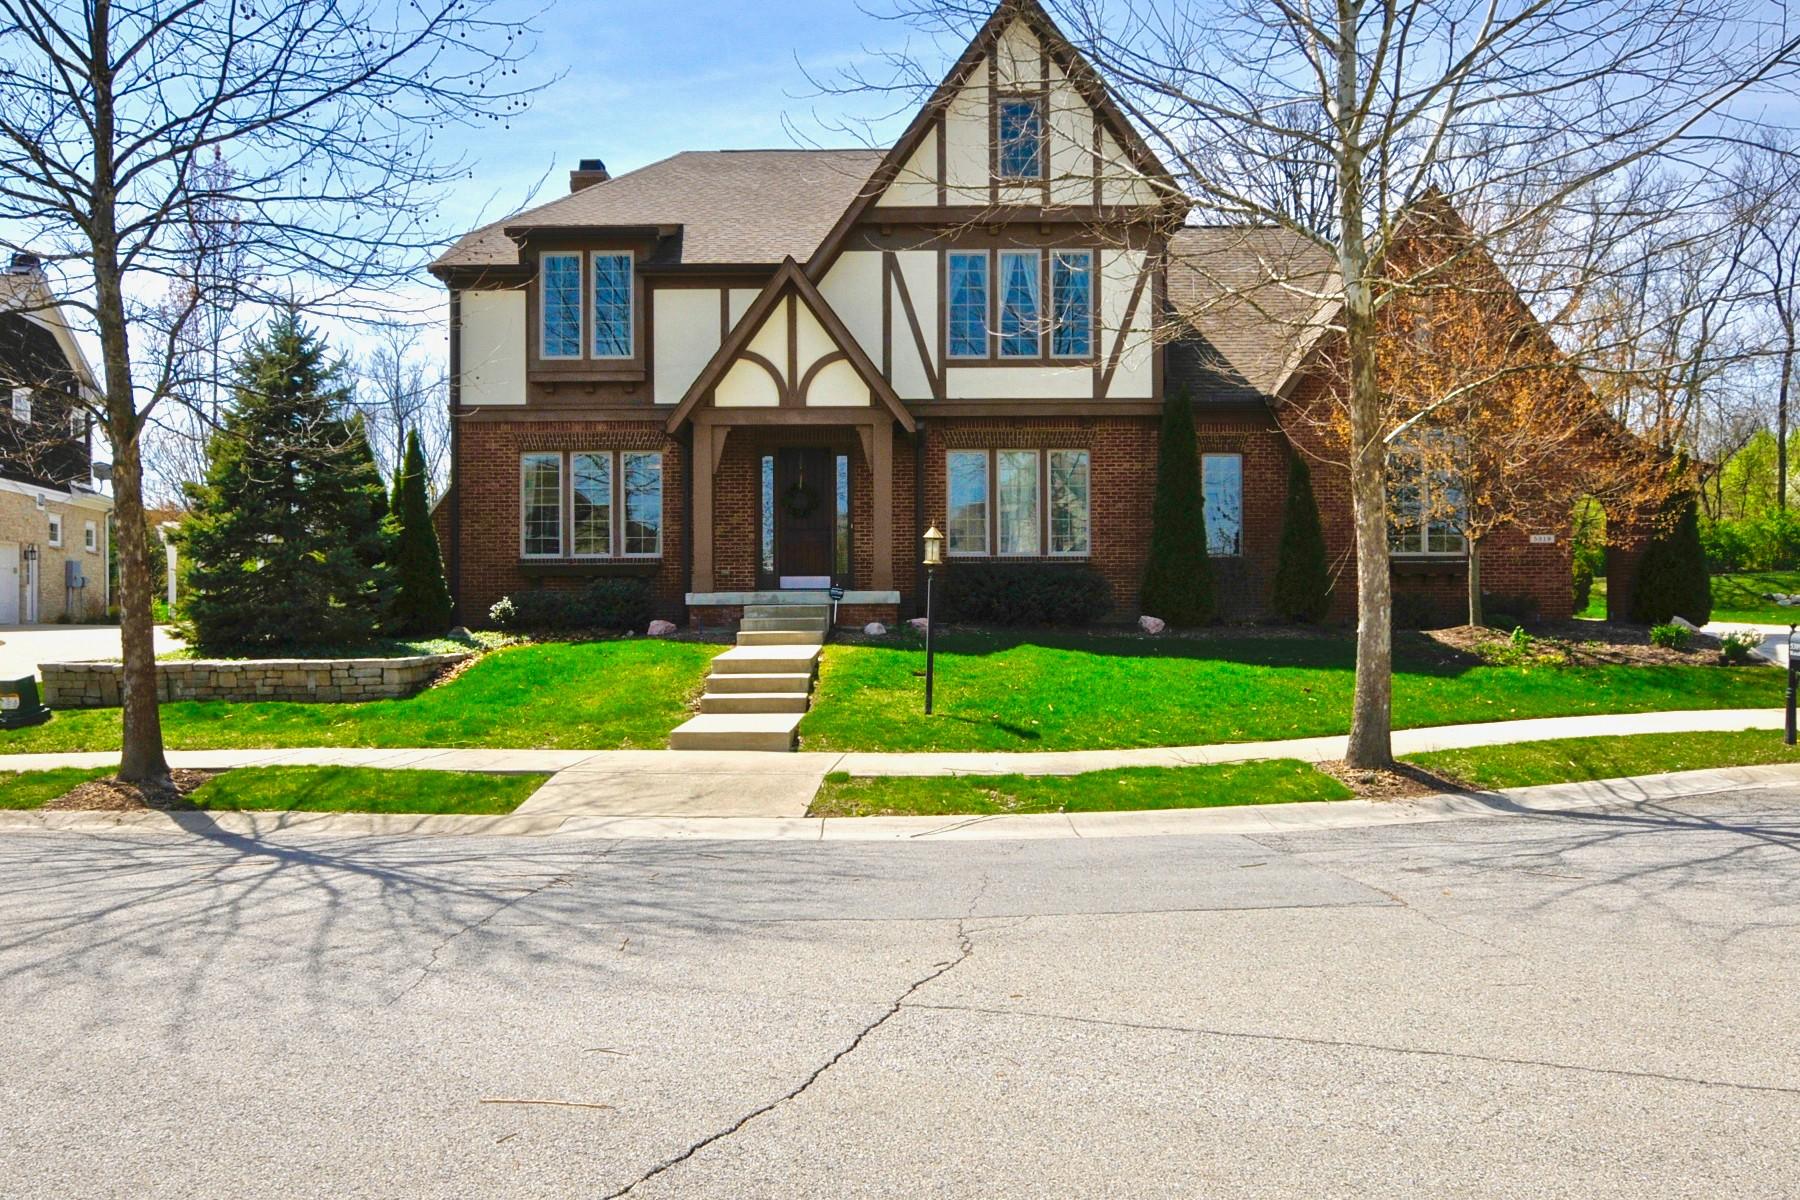 Single Family Home for Sale at Classic Tudor Home 5319 Randolph Crescent Drive Carmel, Indiana, 46033 United States